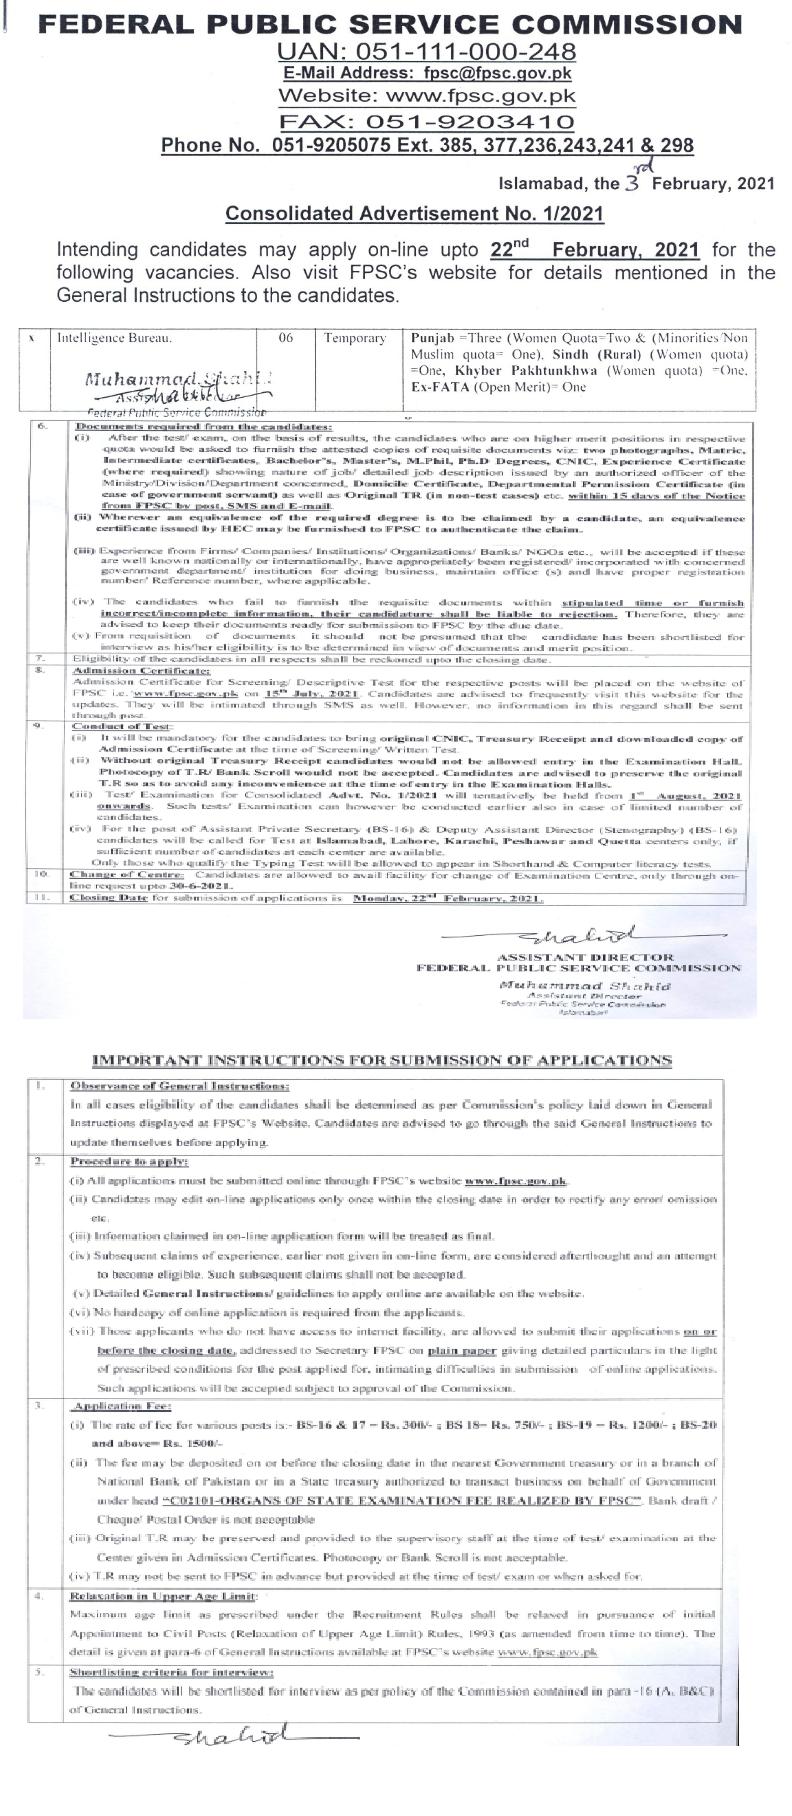 FPSC FIA IB Jobs 2021 Roll No Slips Merit List Download Online